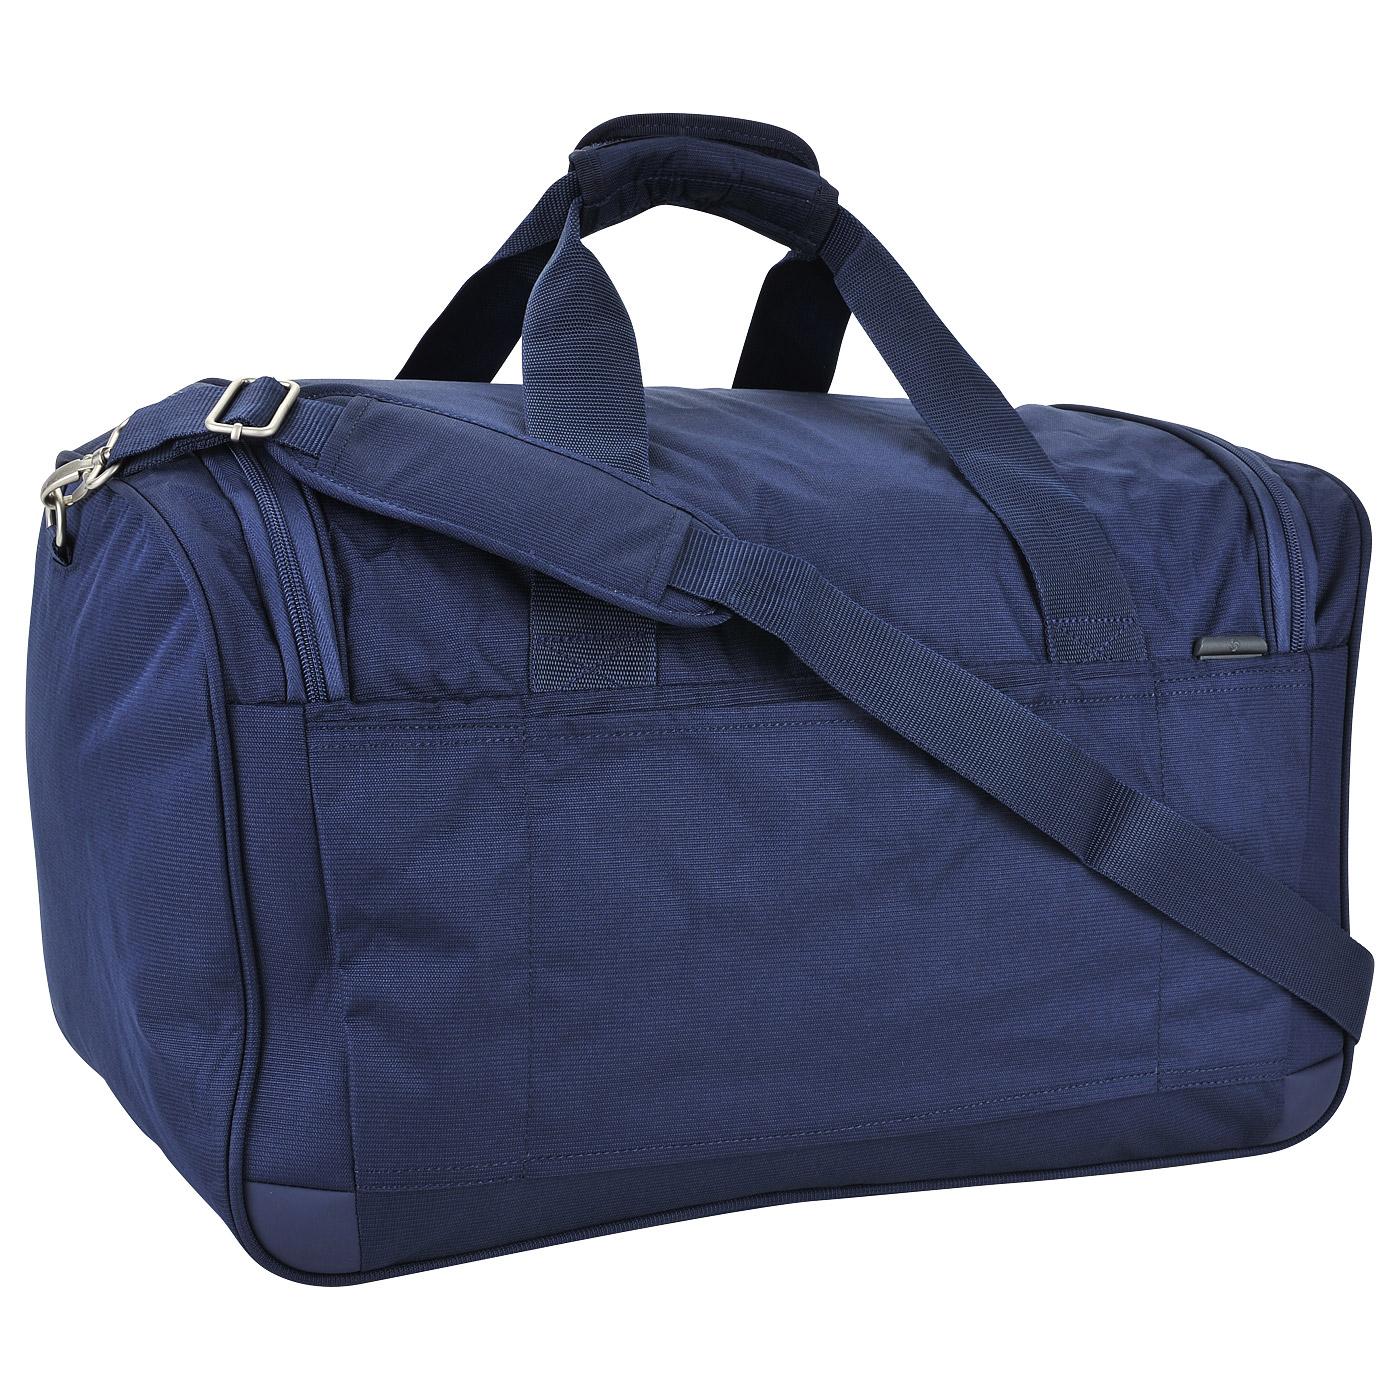 bdee1a651031 Дорожная сумка с плечевым ремешком Samsonite Dynamo 80D41006-i ...